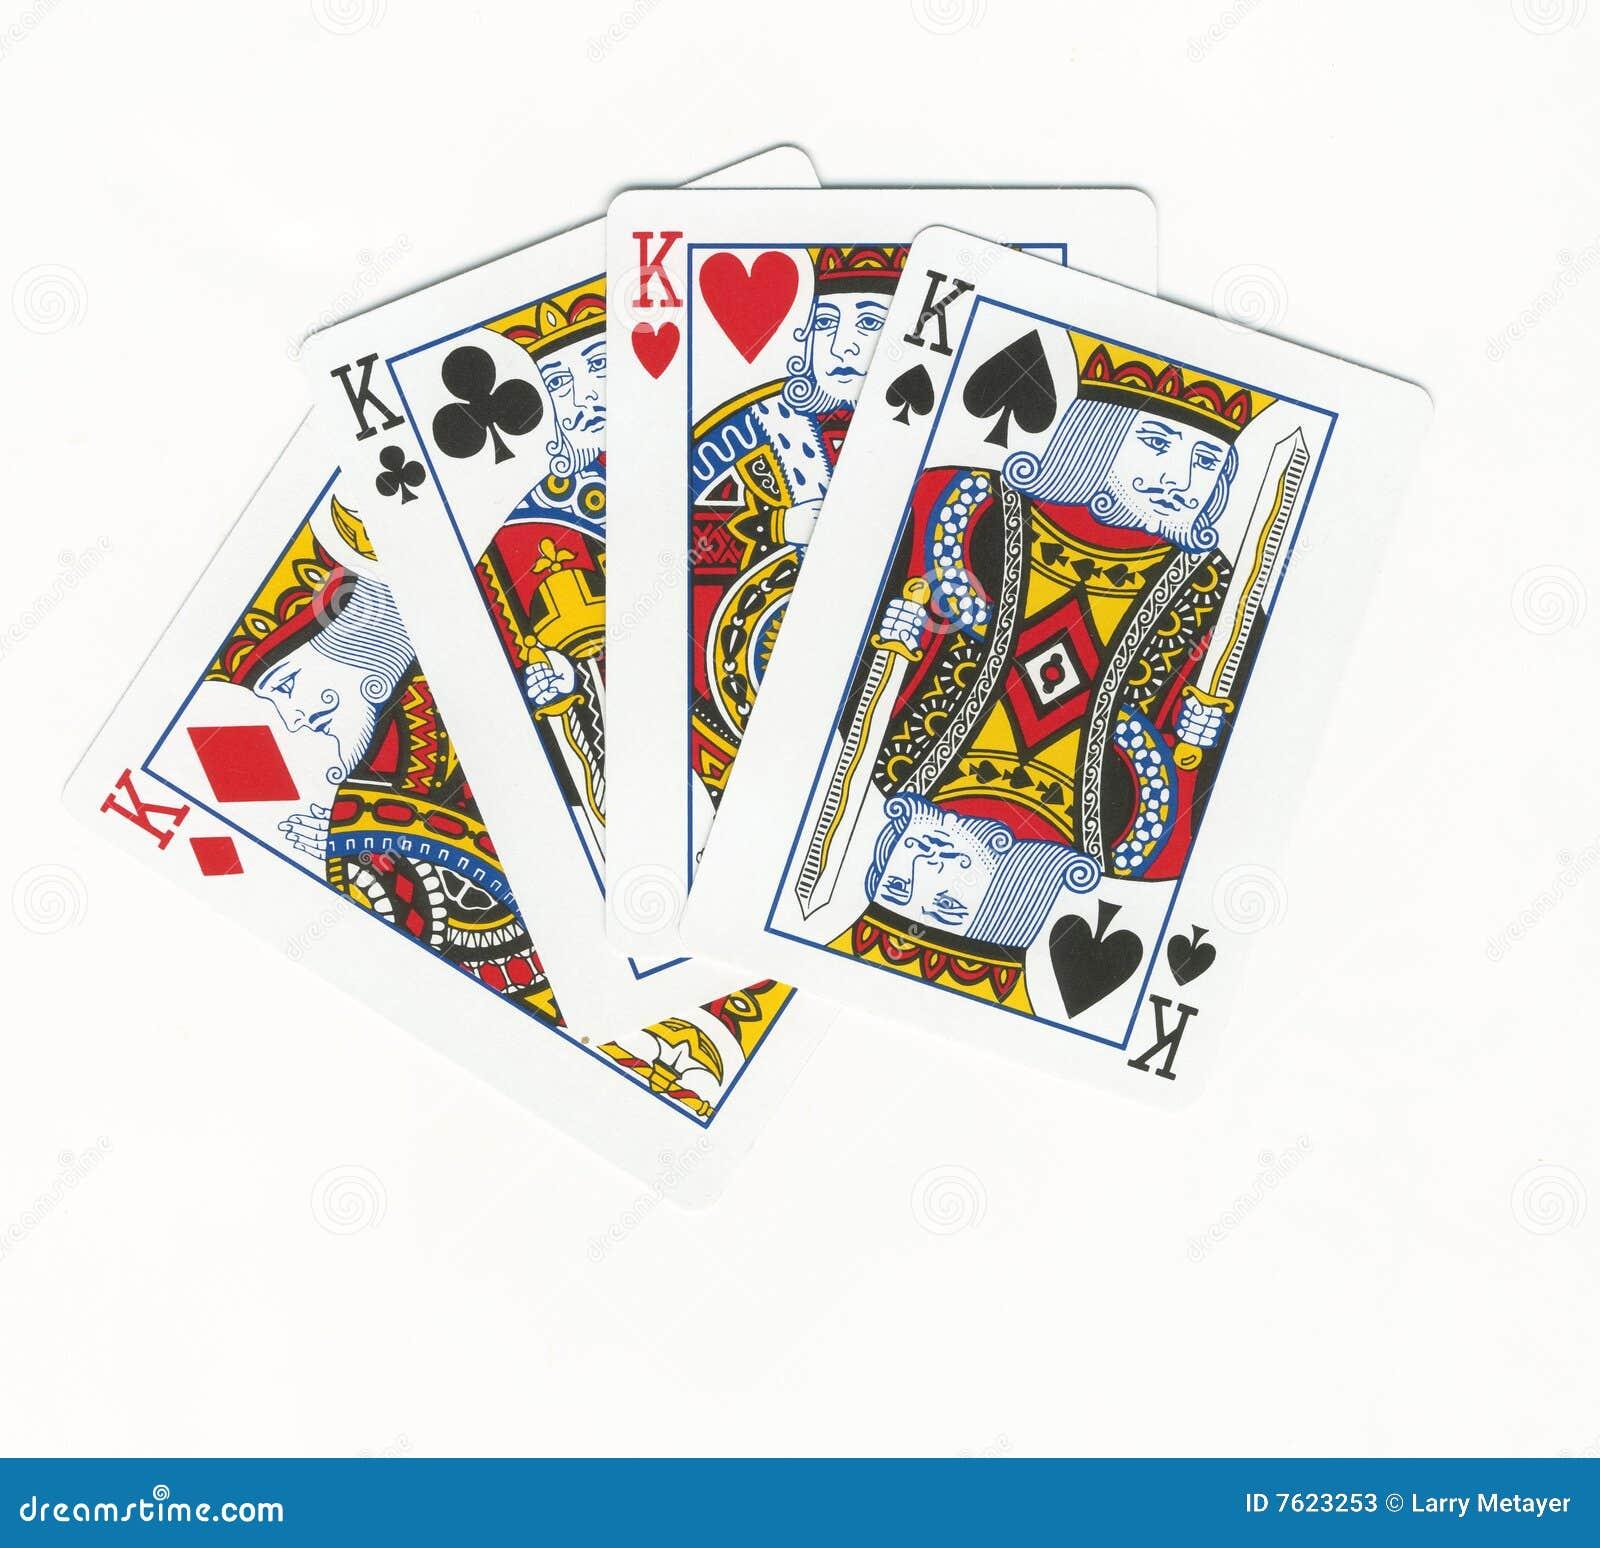 4 kings casino and card club